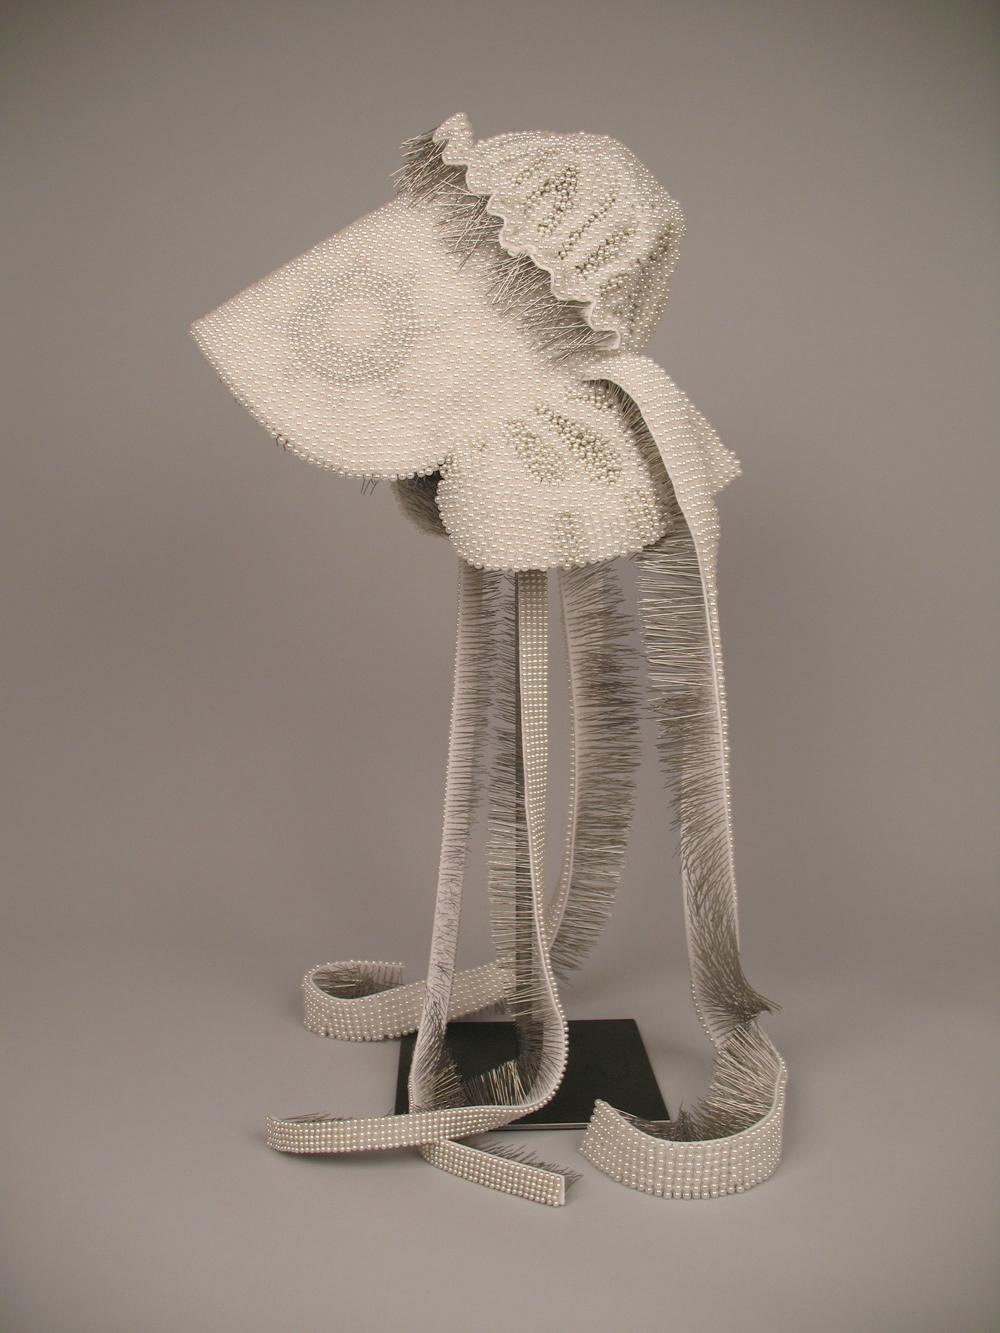 "Seer Bonnet XIV (Delcena)   14,760 pearl corsage pins, fabric, steel, 29"" x 12"" x 14"", 2010"